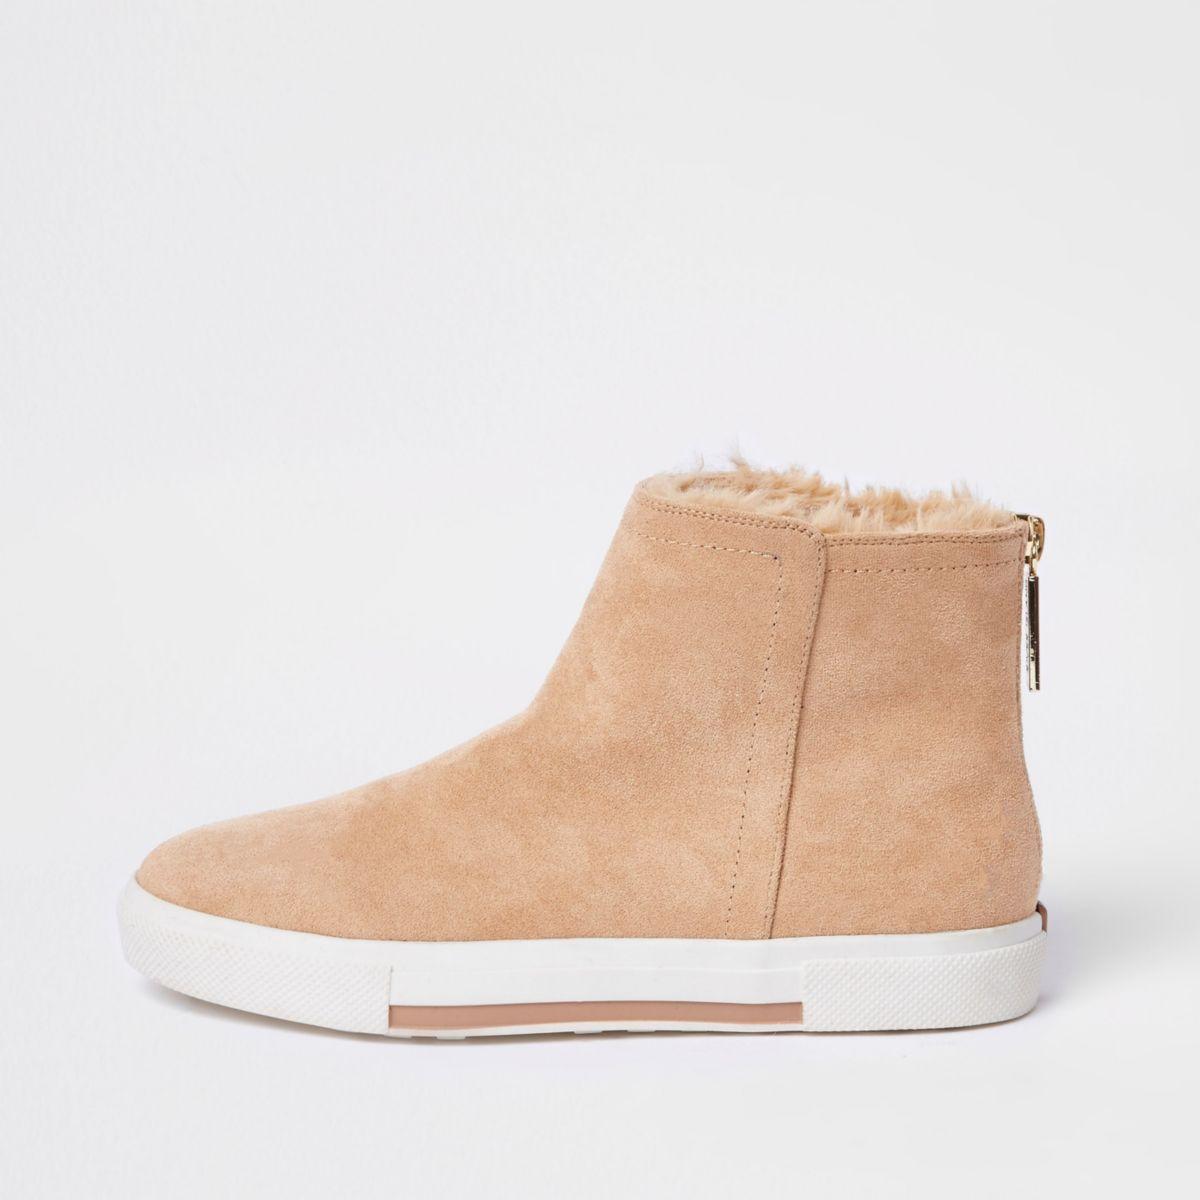 Beige wide fit faux fur lined boots